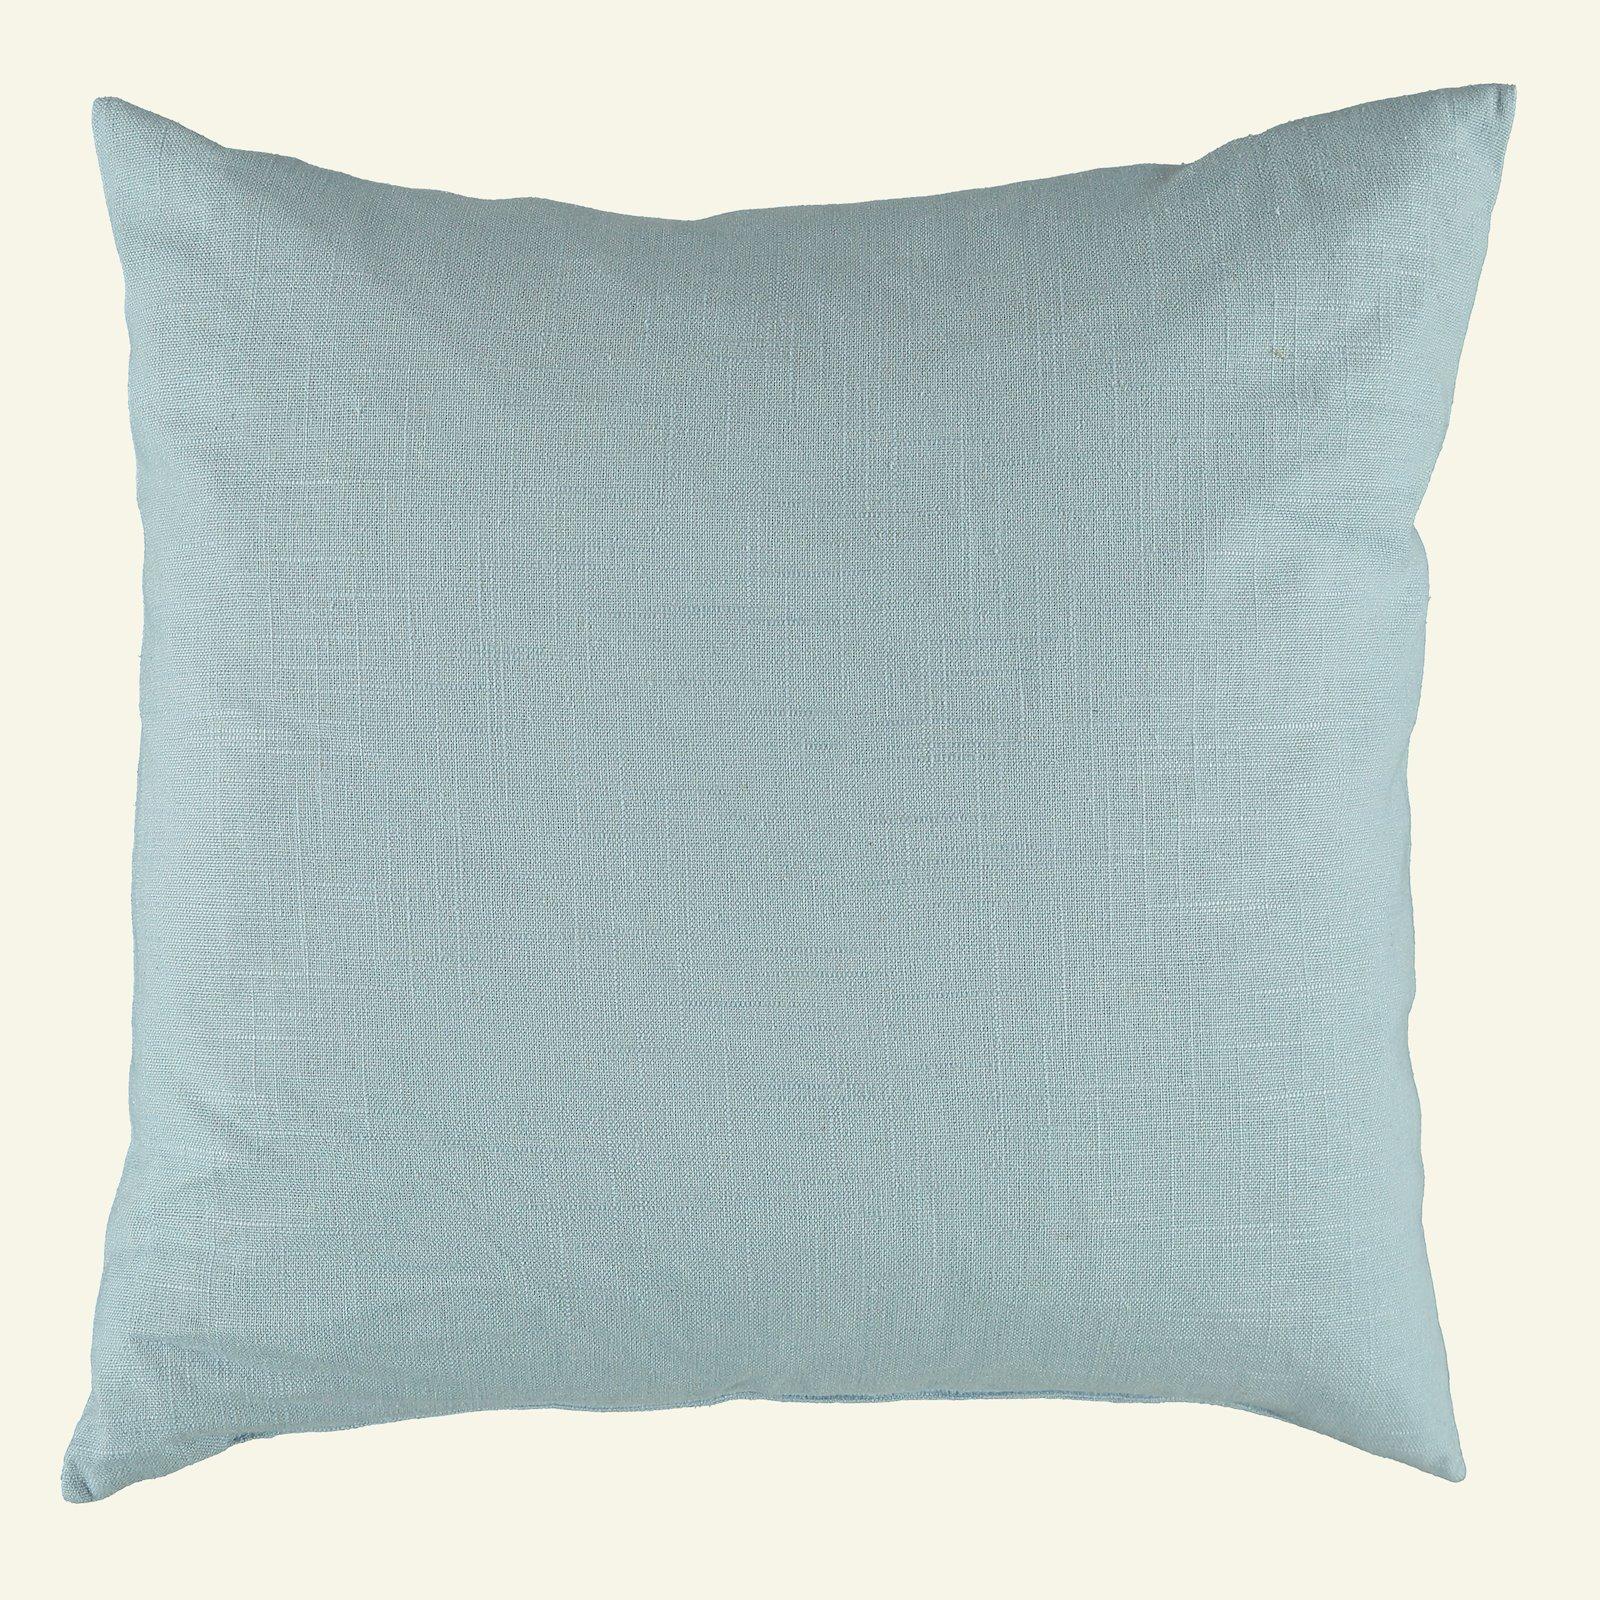 Coarse linen/viscose light blue 852309_sskit